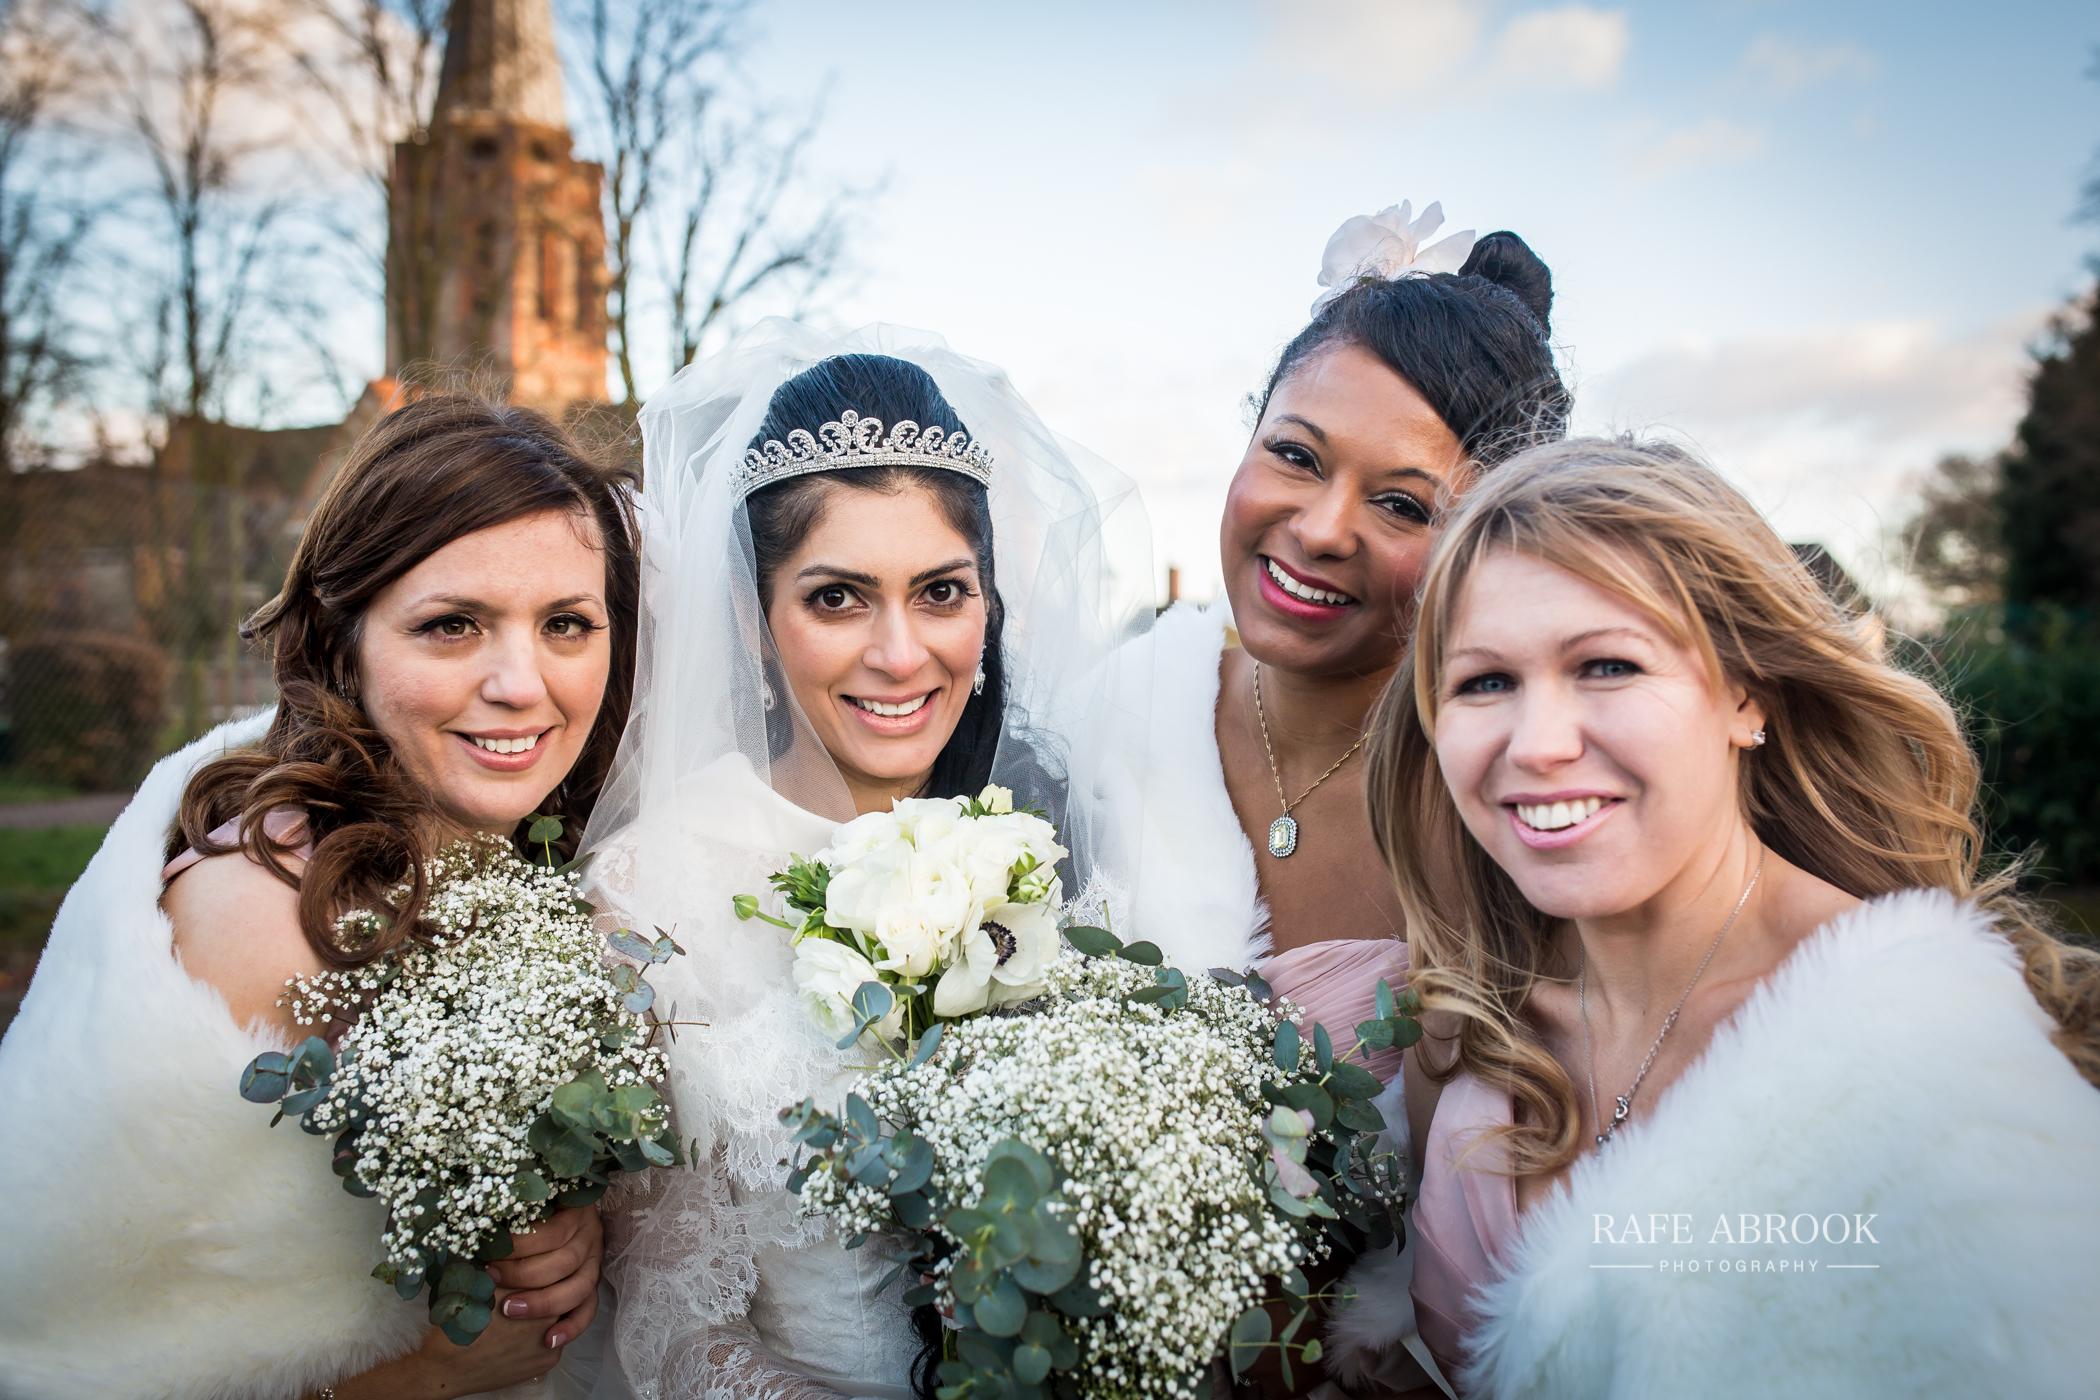 roma & pete wedding hampstead shenley hertfordshire -327.jpg